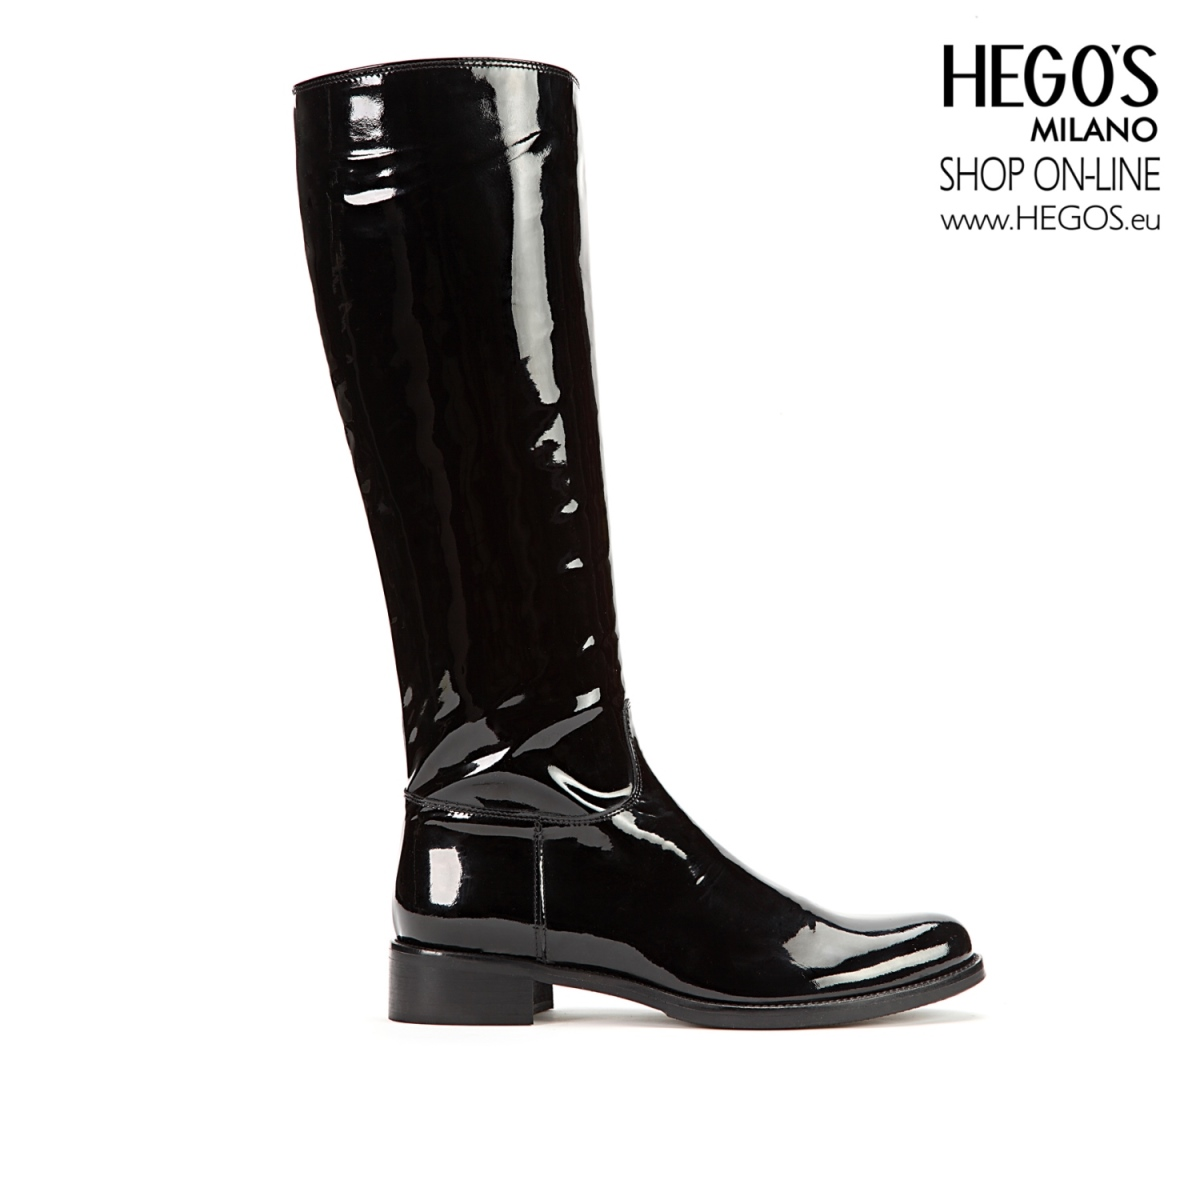 5328_HEGOS_MILANO_699 (2)